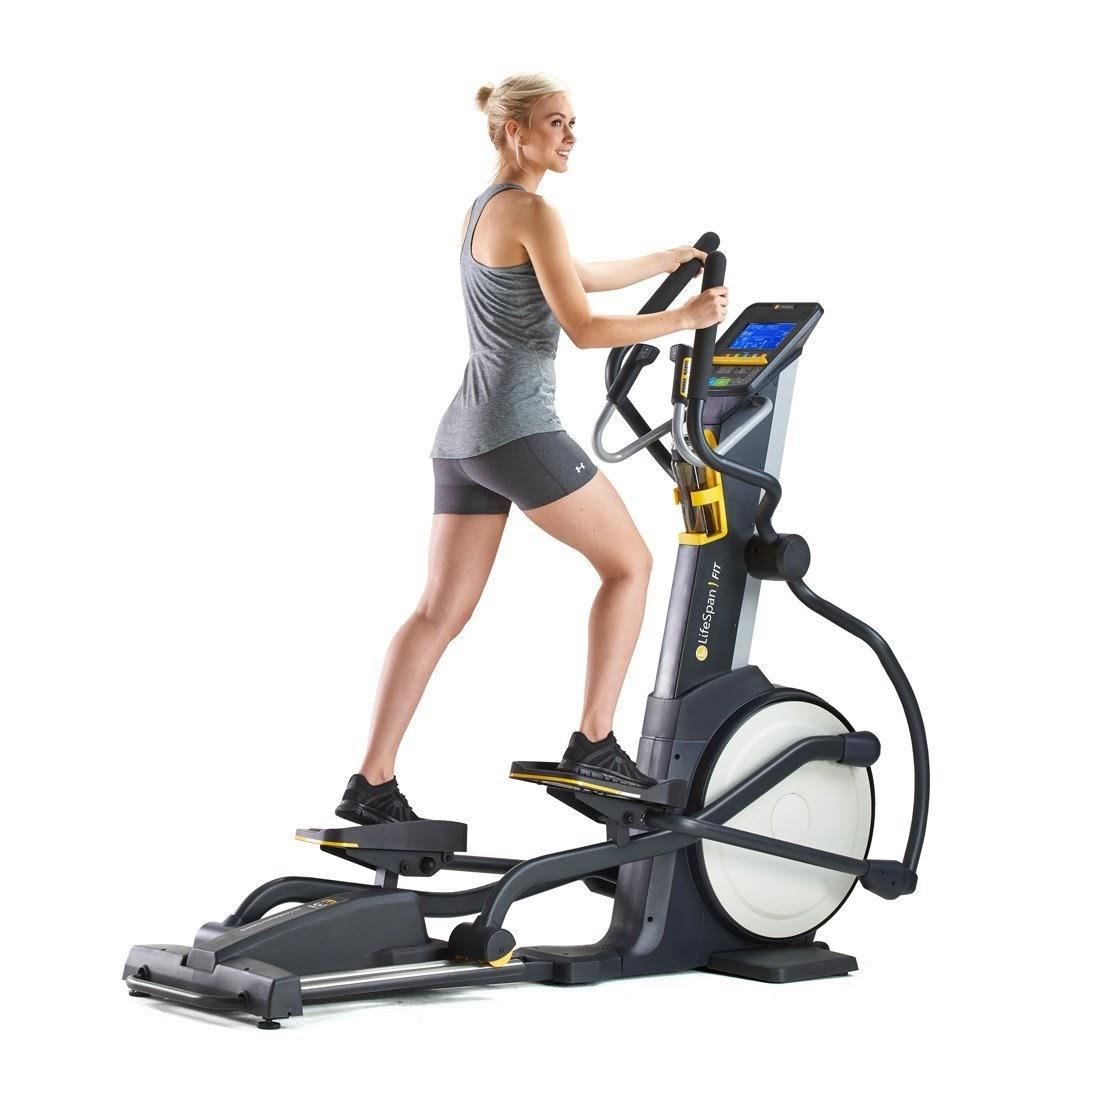 Health And Fitness Den: Comparing LifeSpan E2i Versus